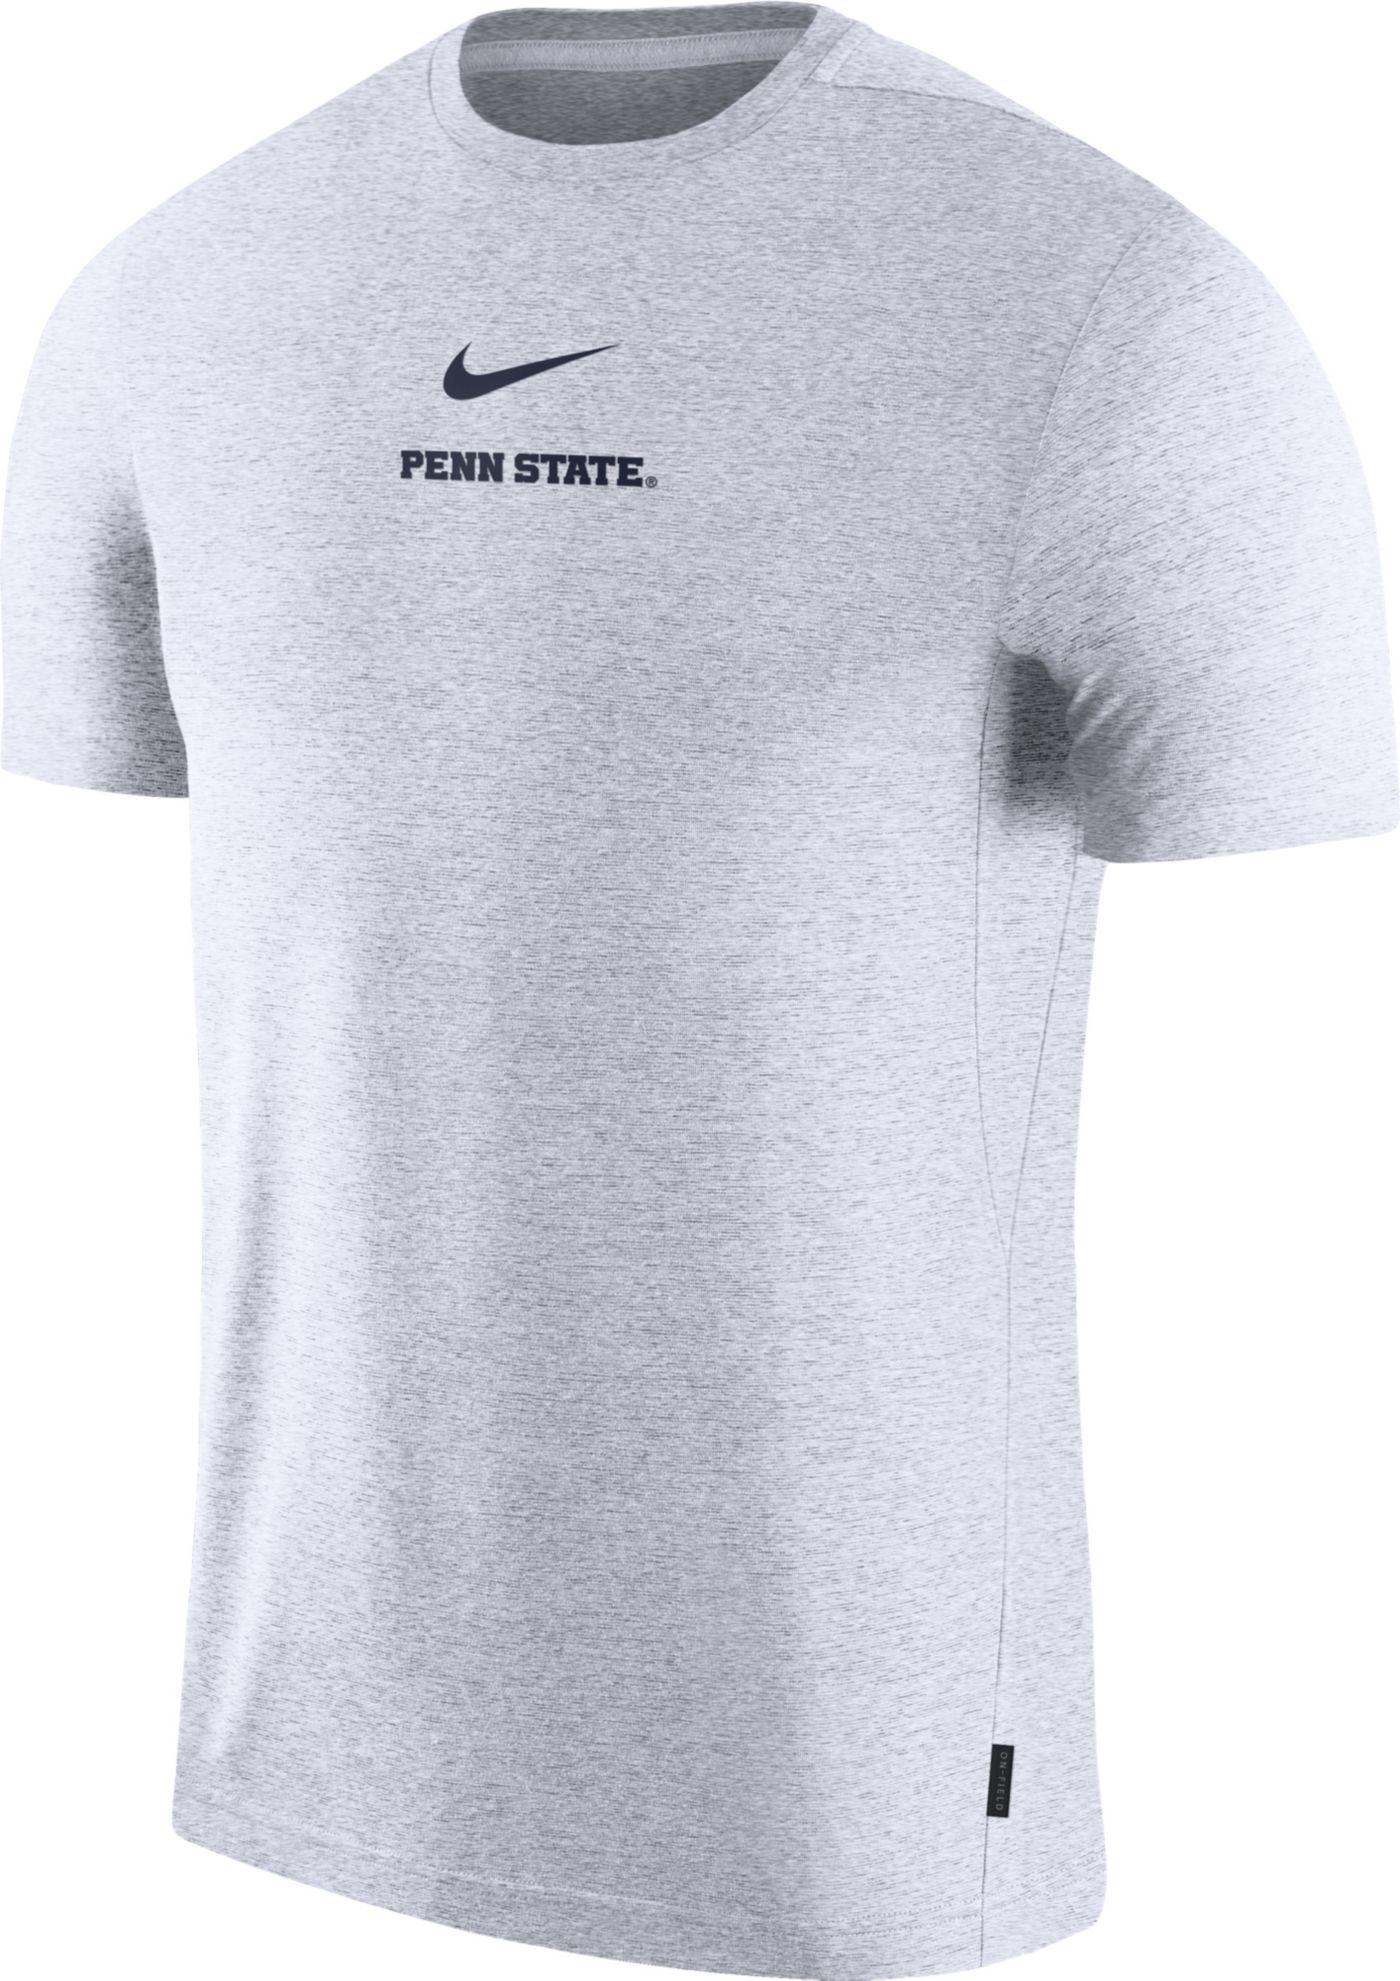 Nike Men's Penn State Nittany Lions Dri-FIT Coach UV Football White T-Shirt